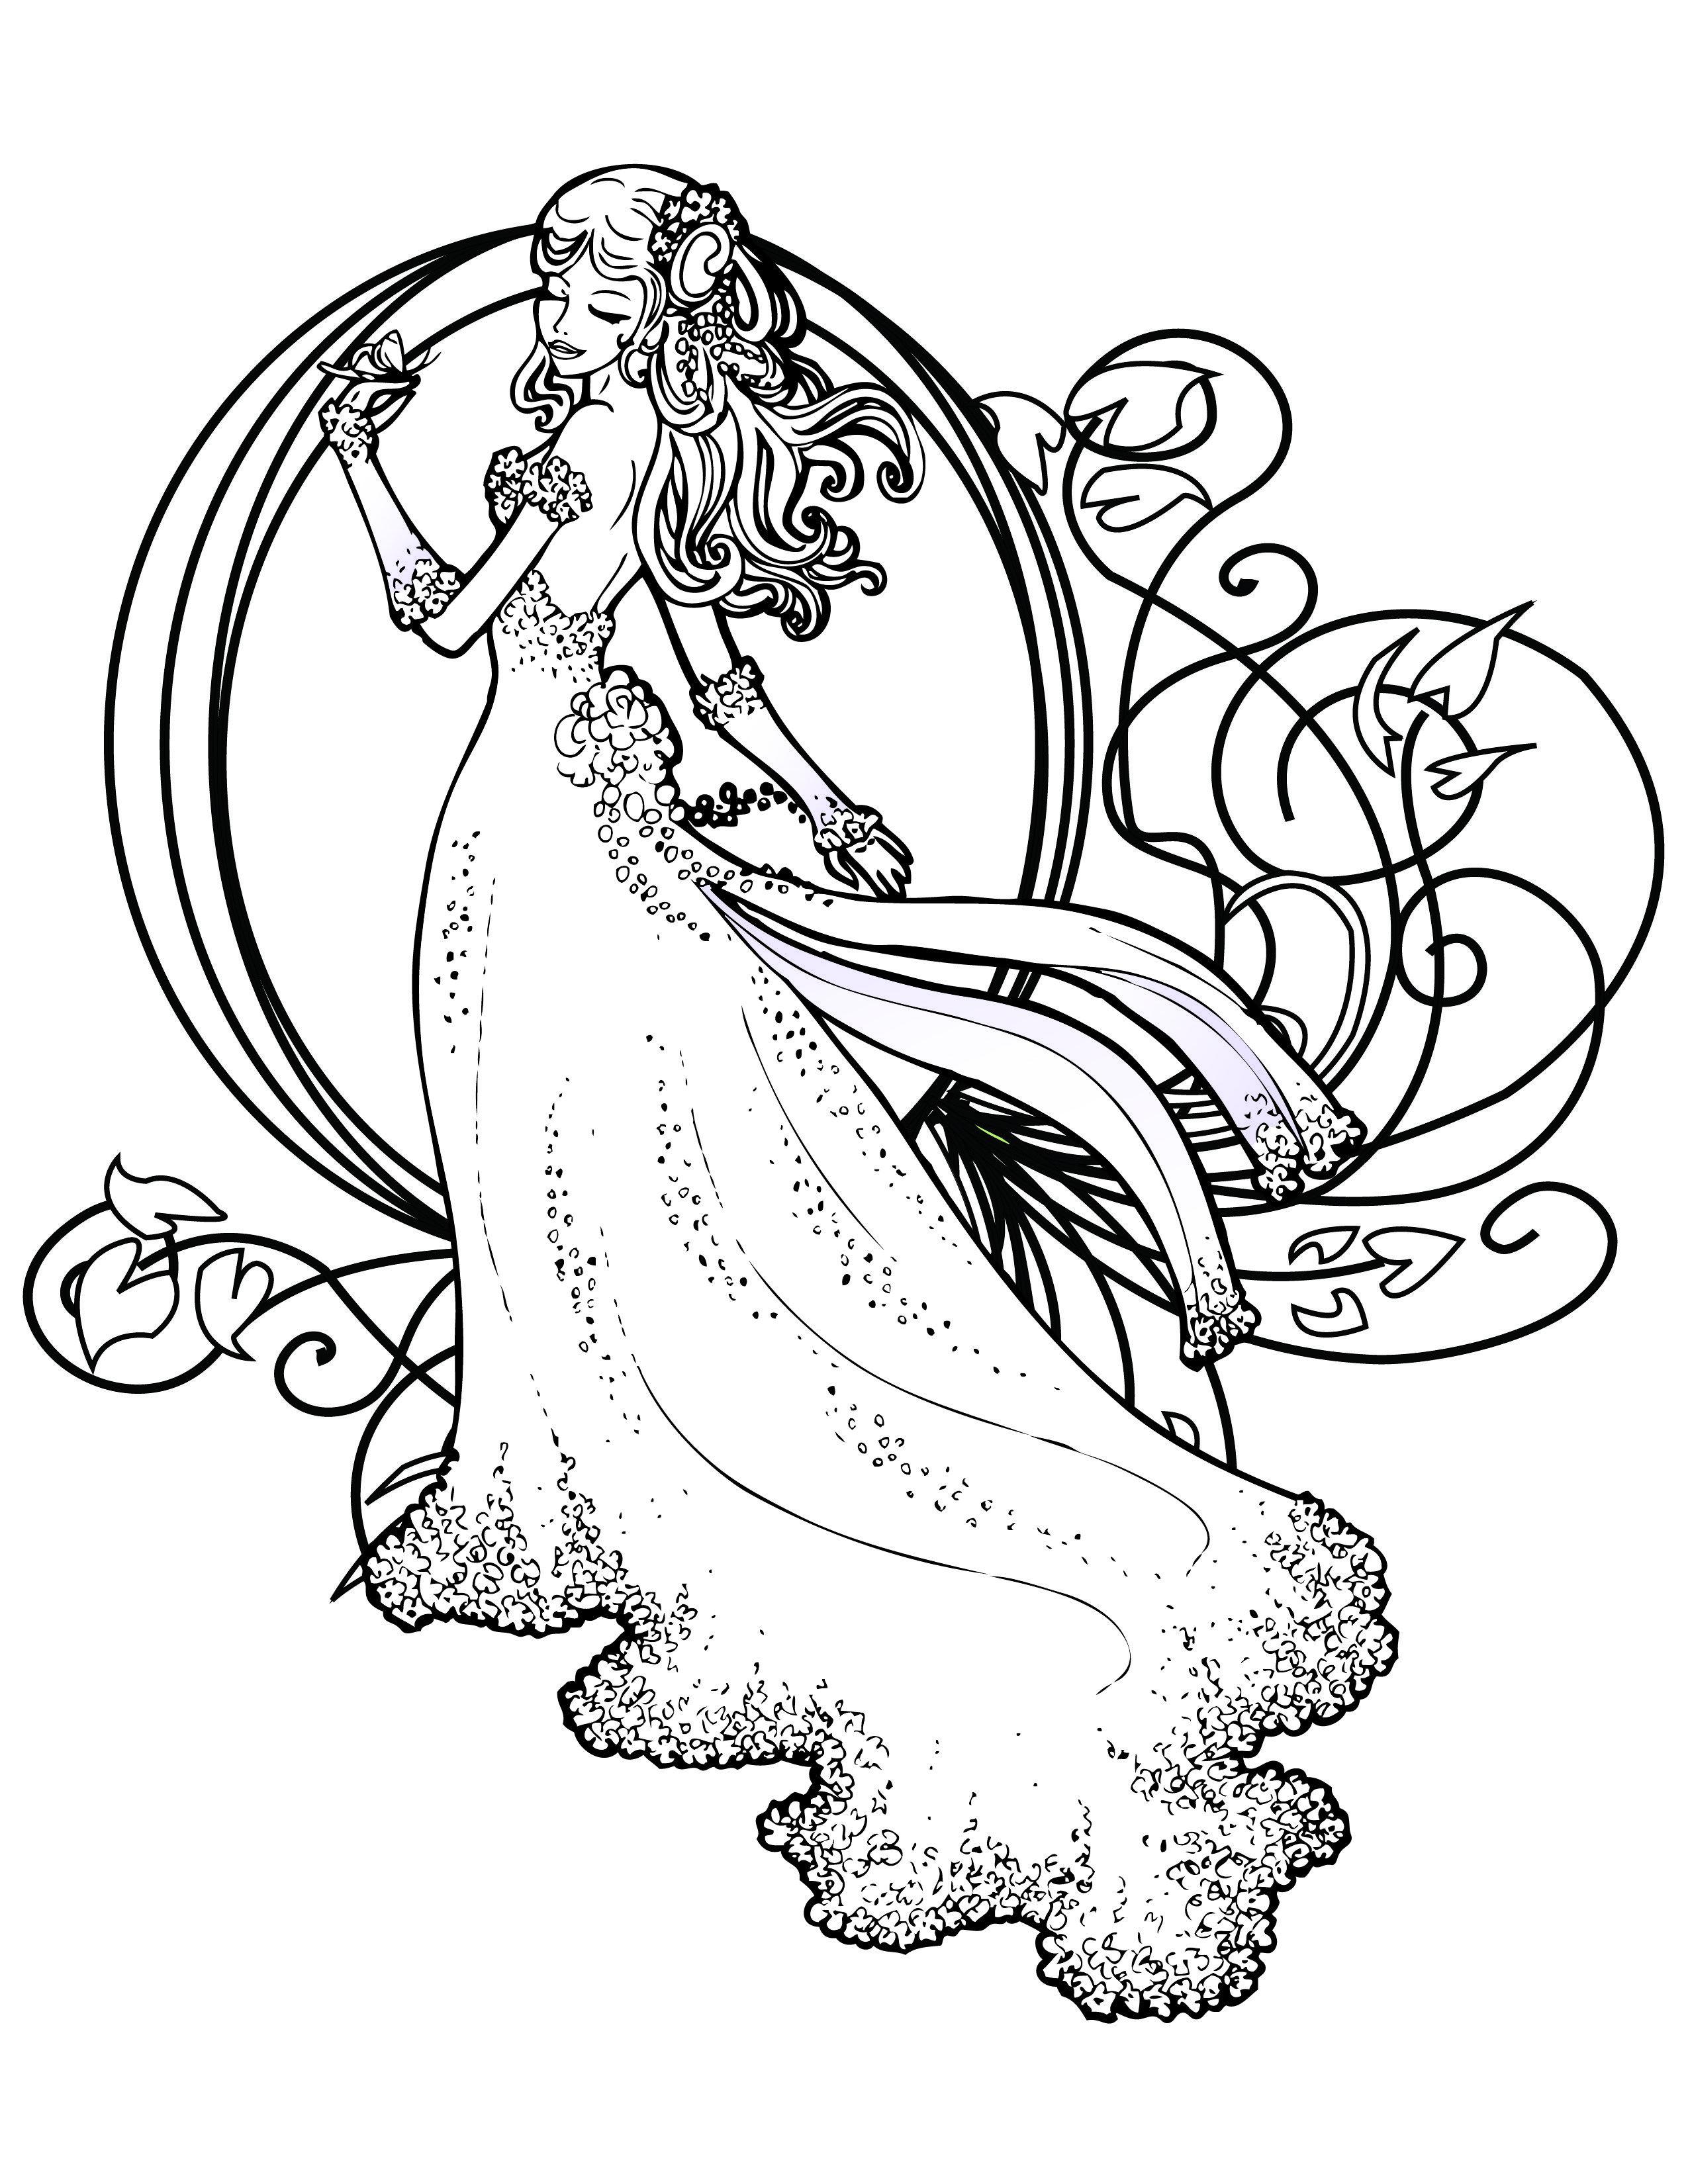 Coloriage De Princesse Disney Gratuit À Imprimer intérieur Coloriage A Imprimer Disney